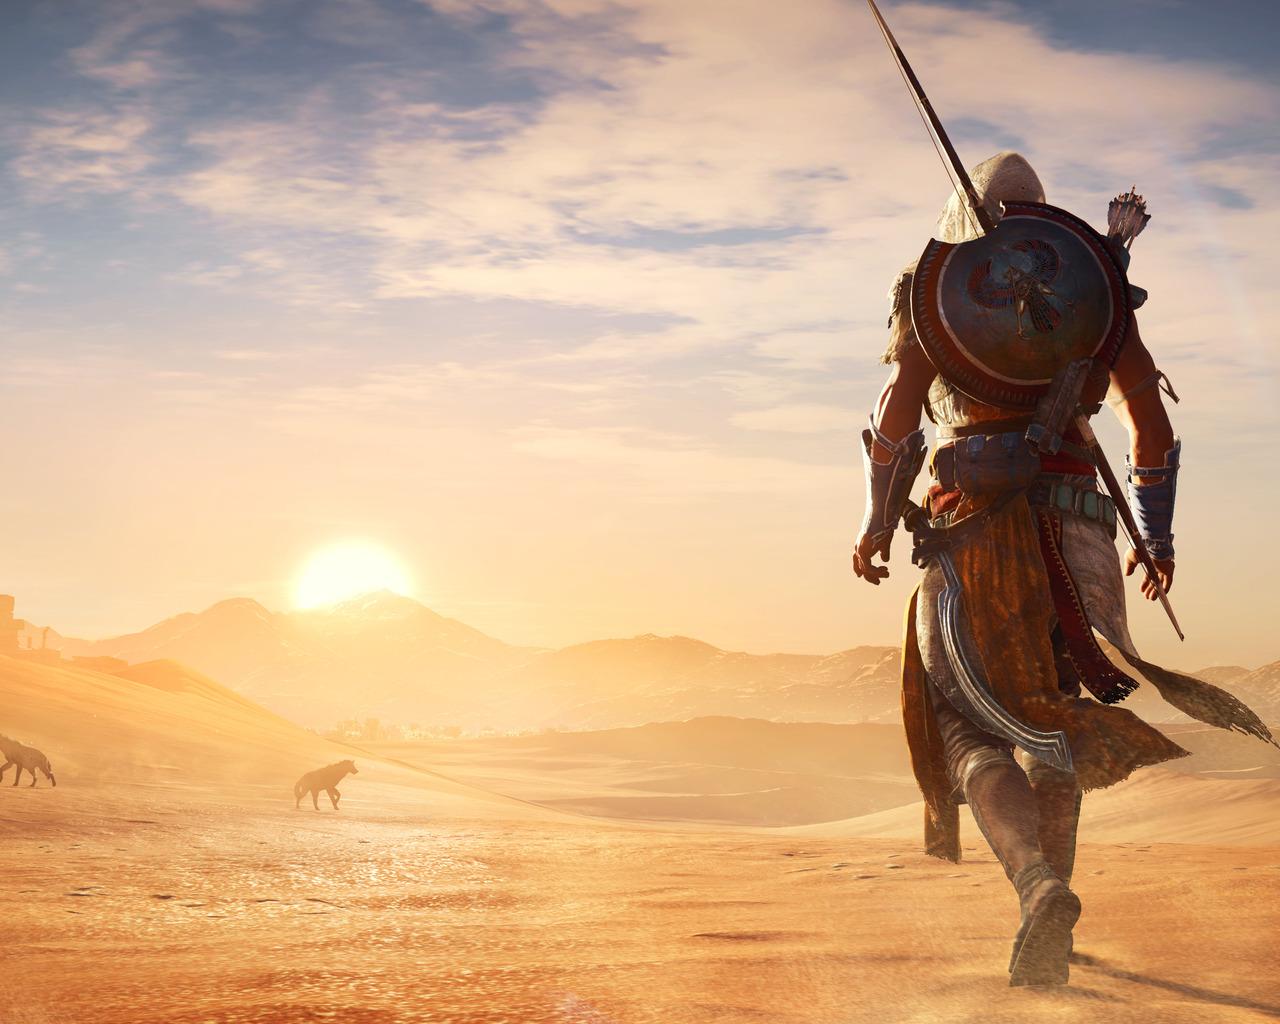 1280x1024 Assassins Creed Origins 1280x1024 Resolution Hd 4k